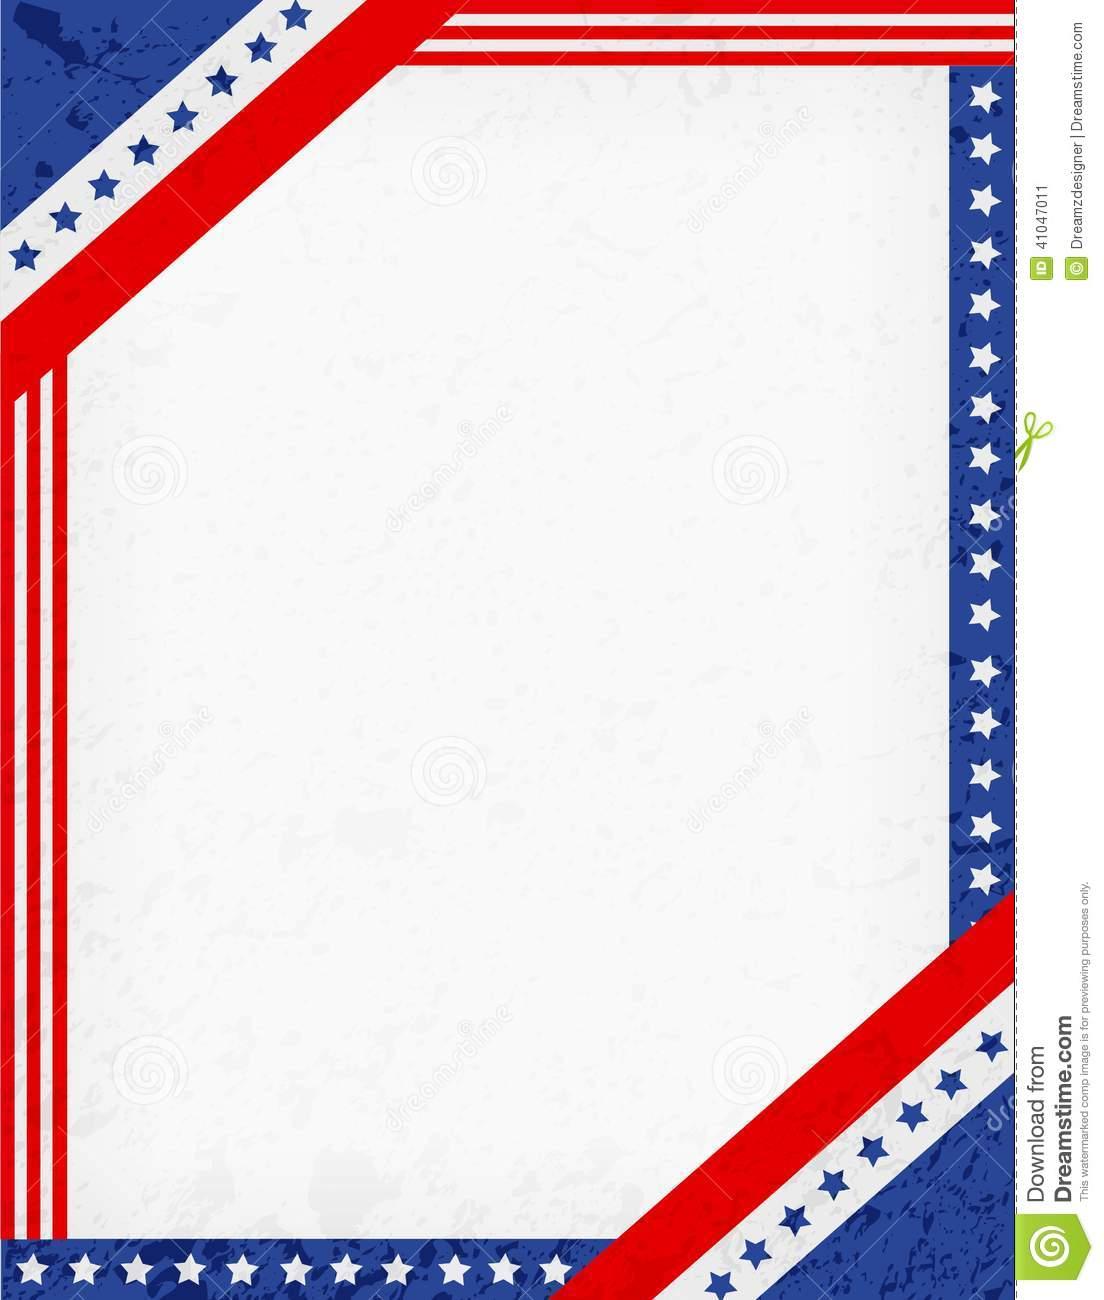 13 Patriotic Vector Borders Images - American Flag Border ...